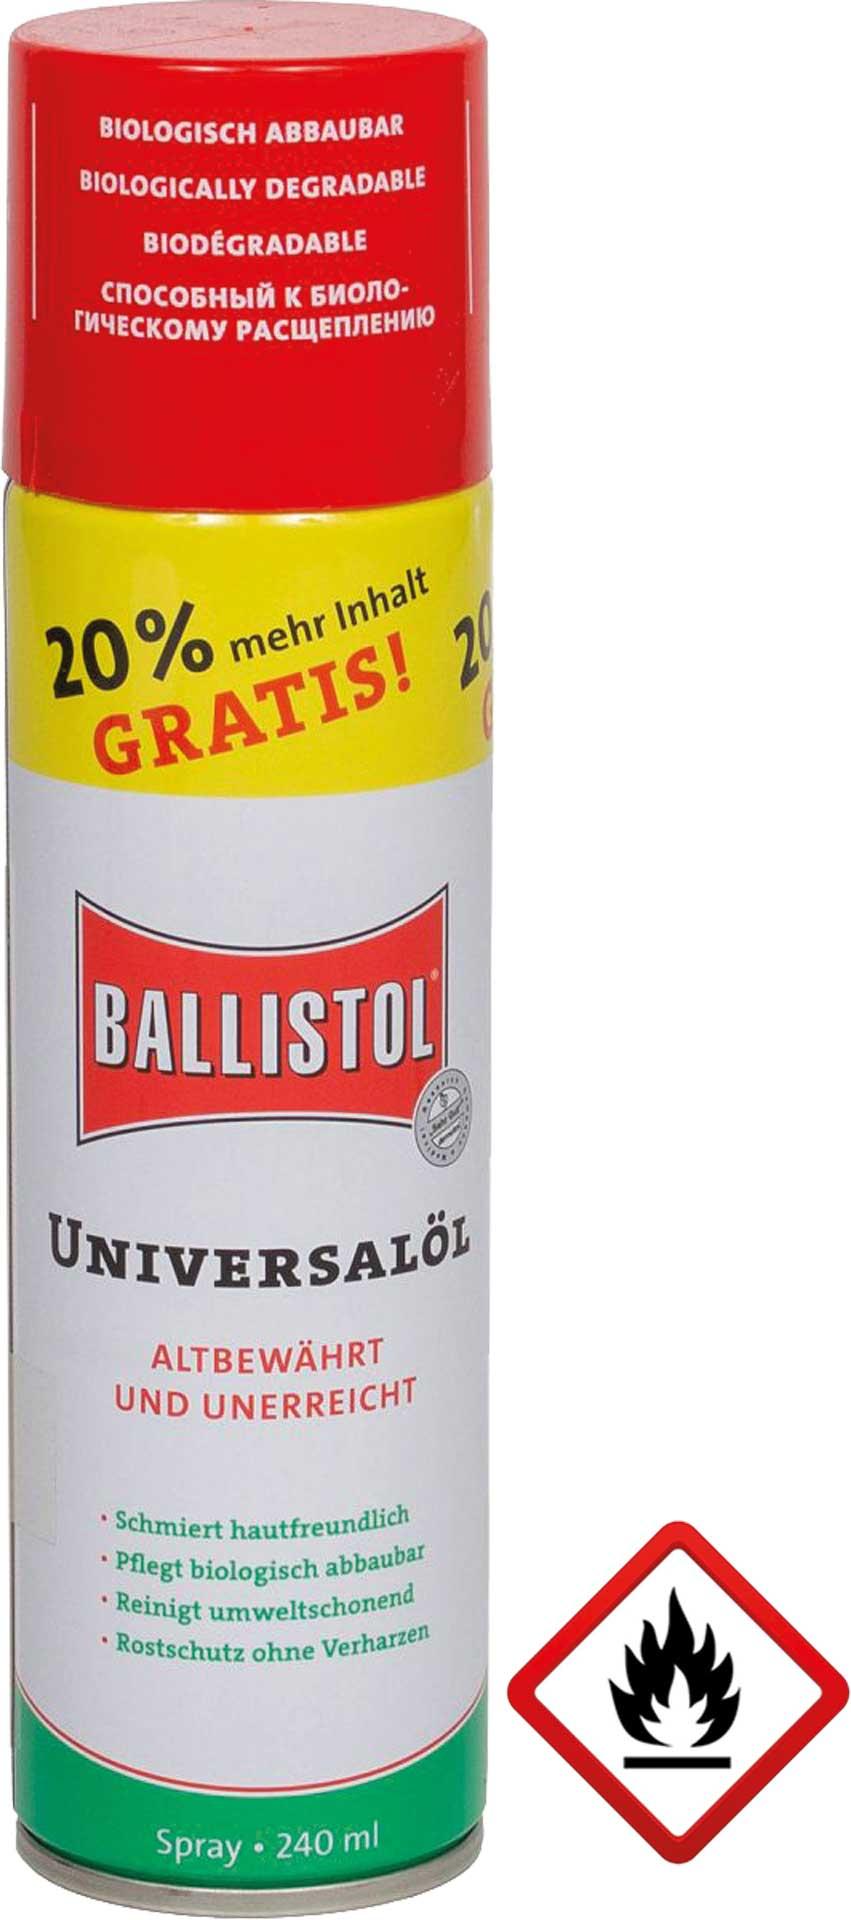 BALLISTOL UNIVERSAL ÖL SPRAY 240ML LIMITIERTE AUFLAGE!